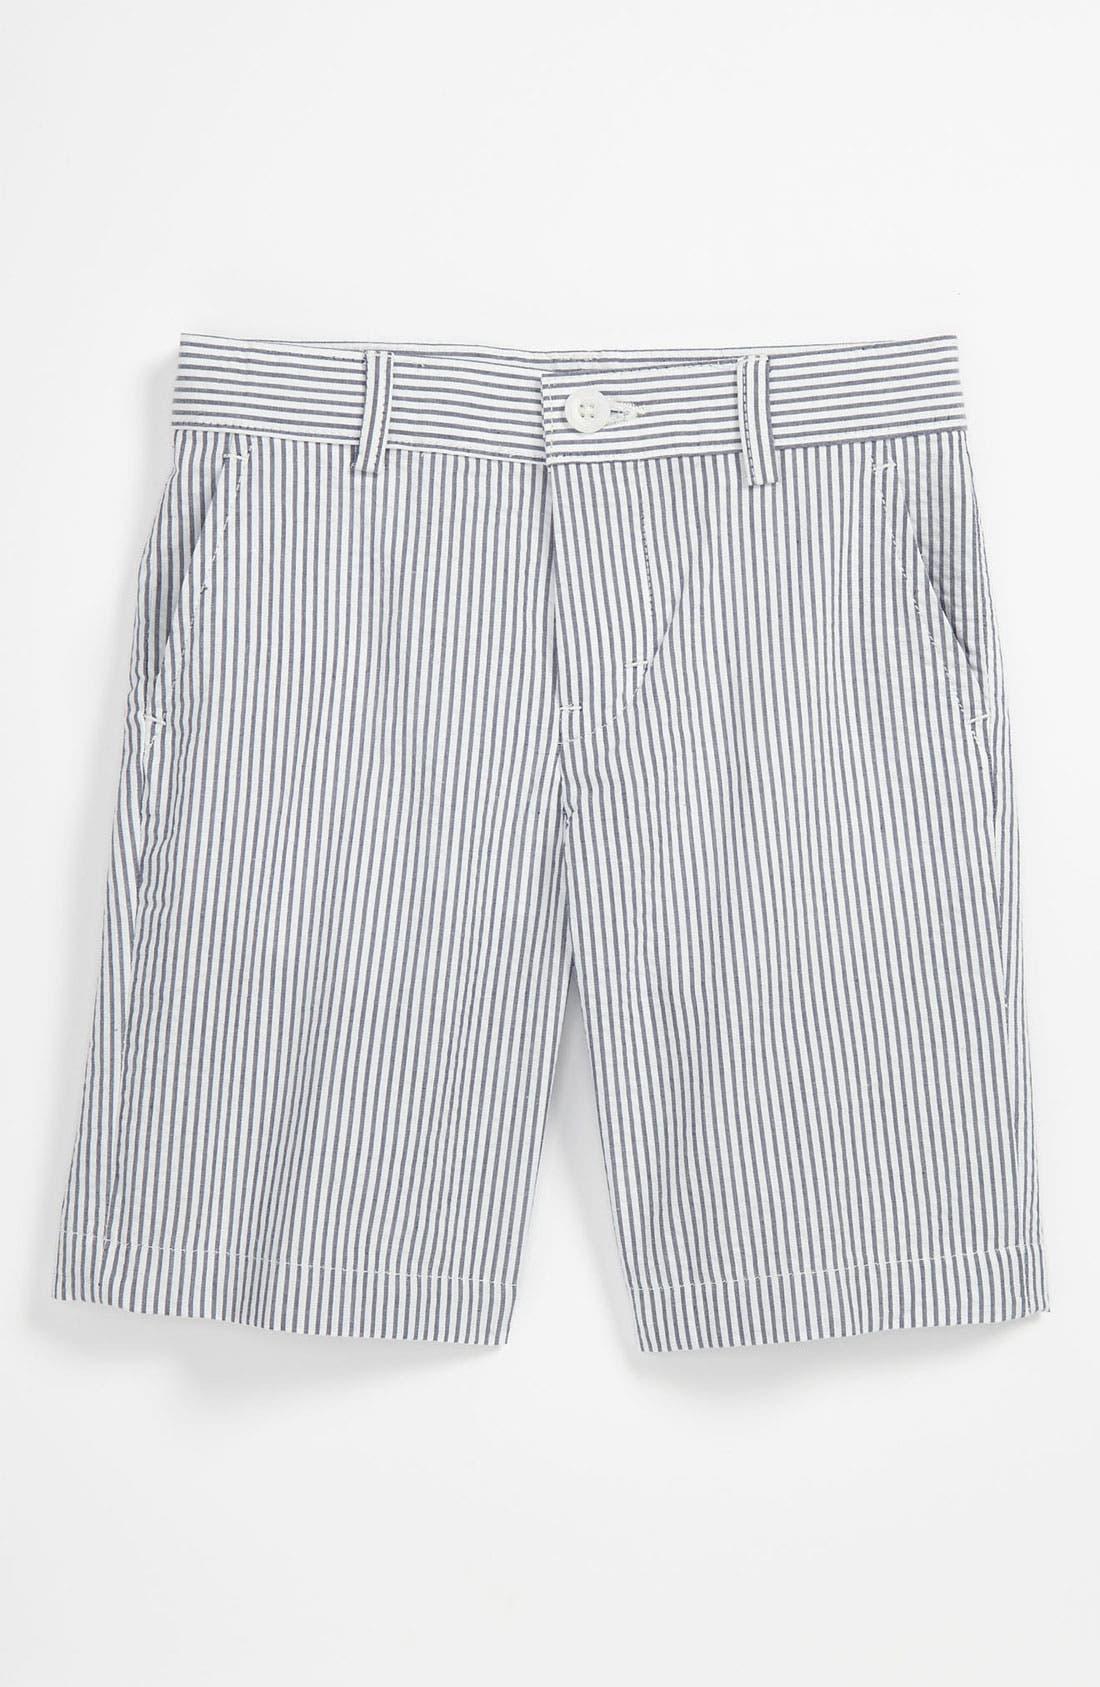 Alternate Image 1 Selected - Nordstrom 'Timothy' Seersucker Shorts (Toddler)